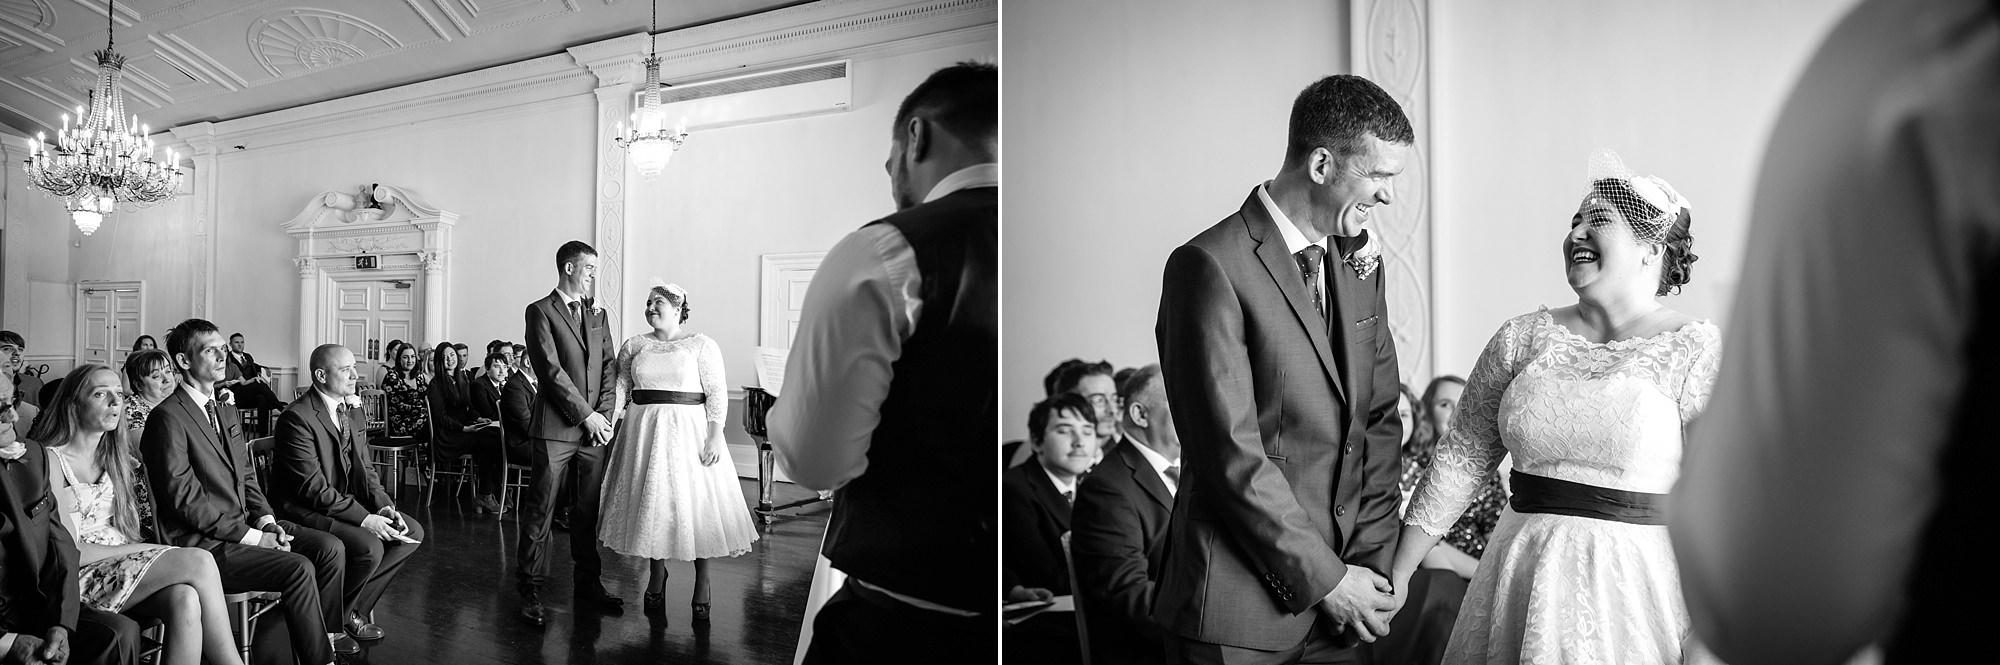 Trafalgar Tavern wedding bride and broom during ceremony reading